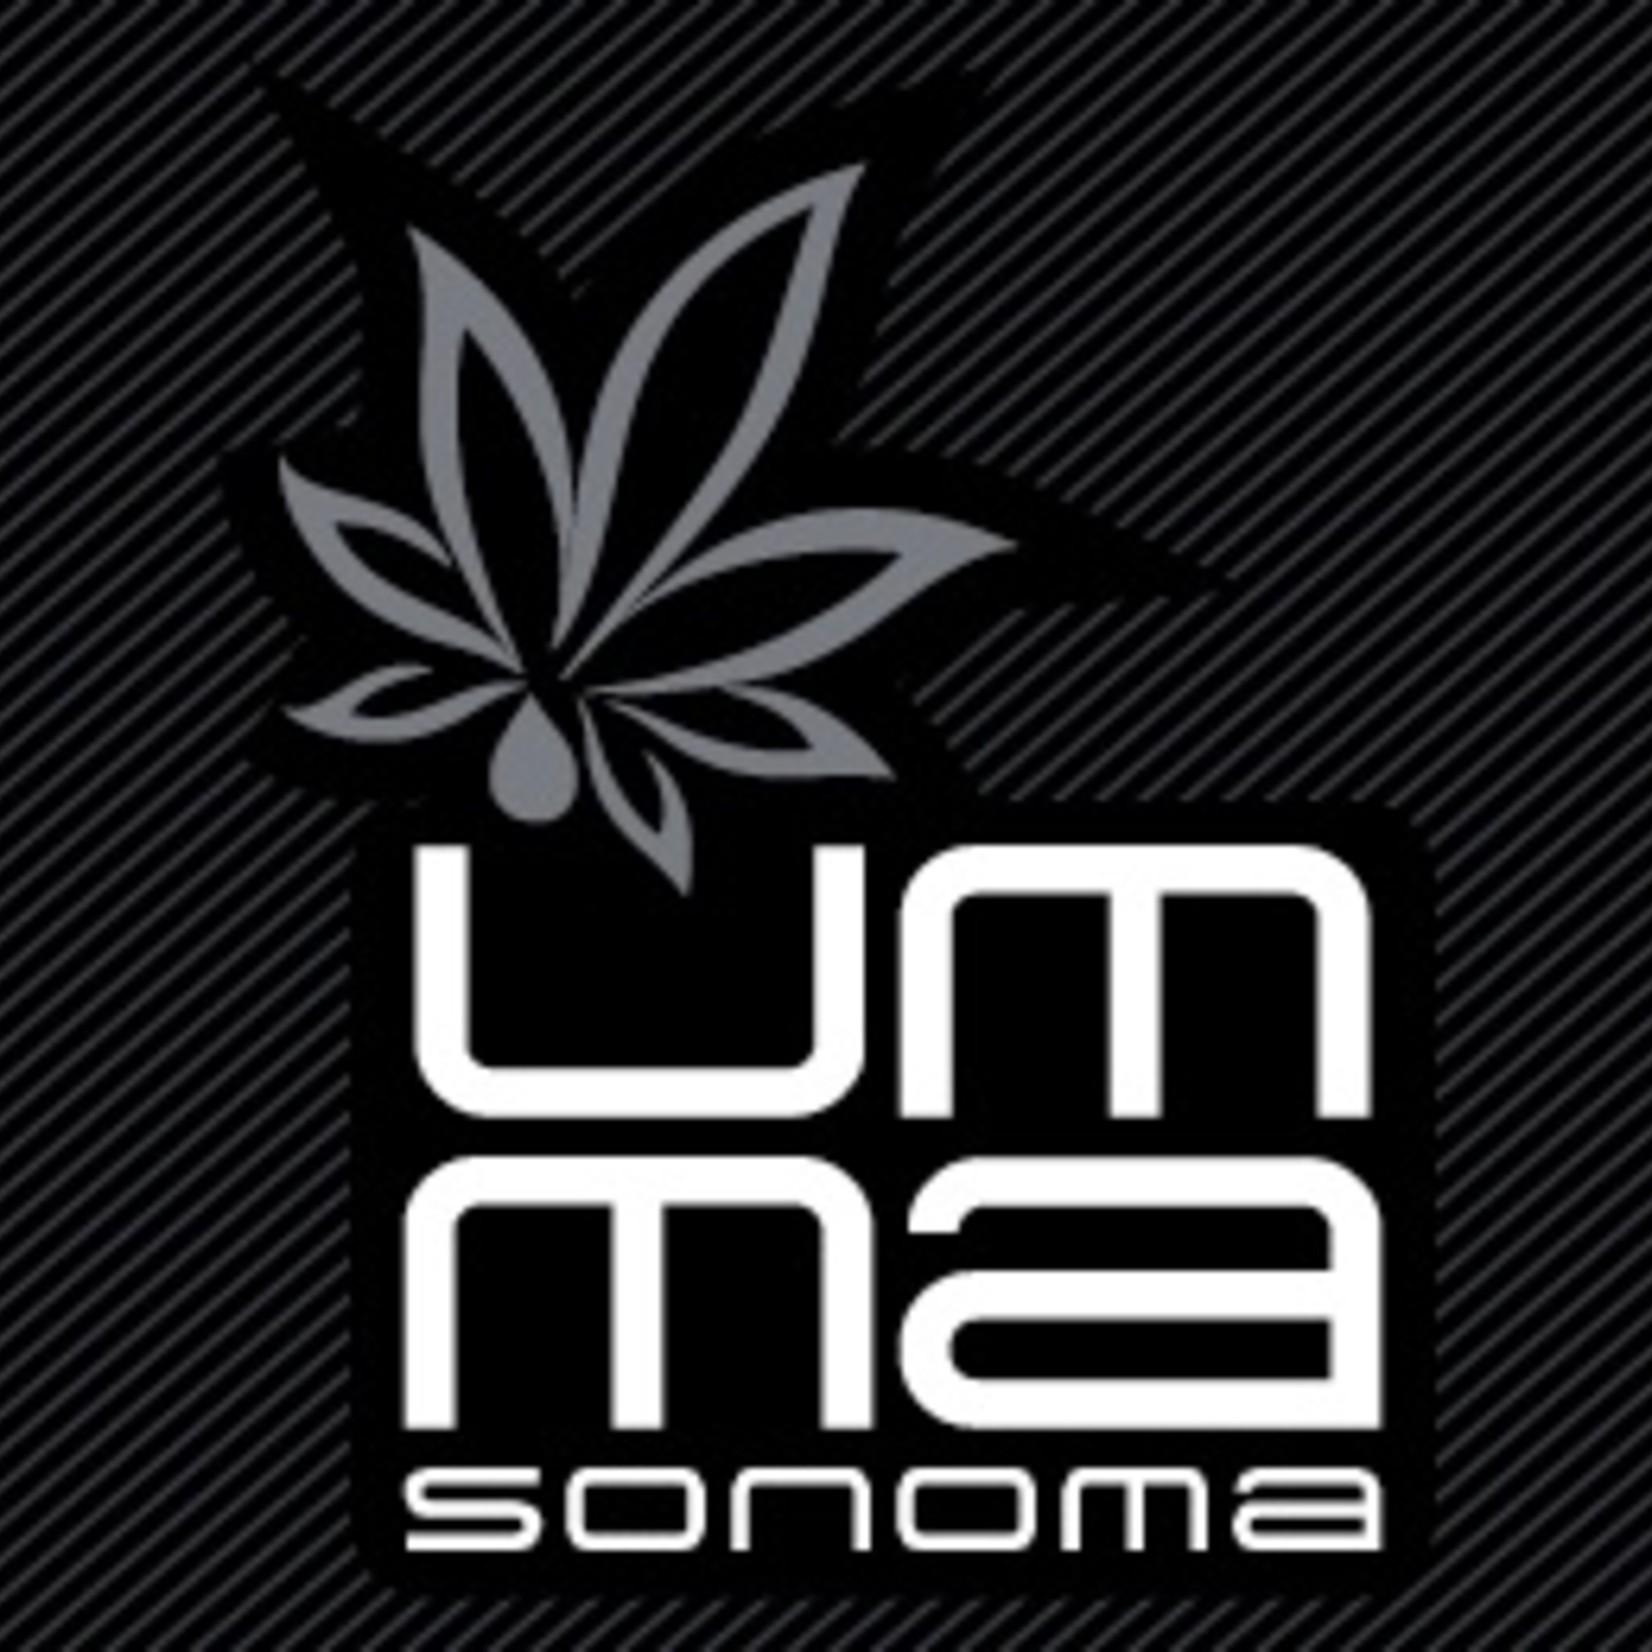 UMMA Sonoma / Guavoisier